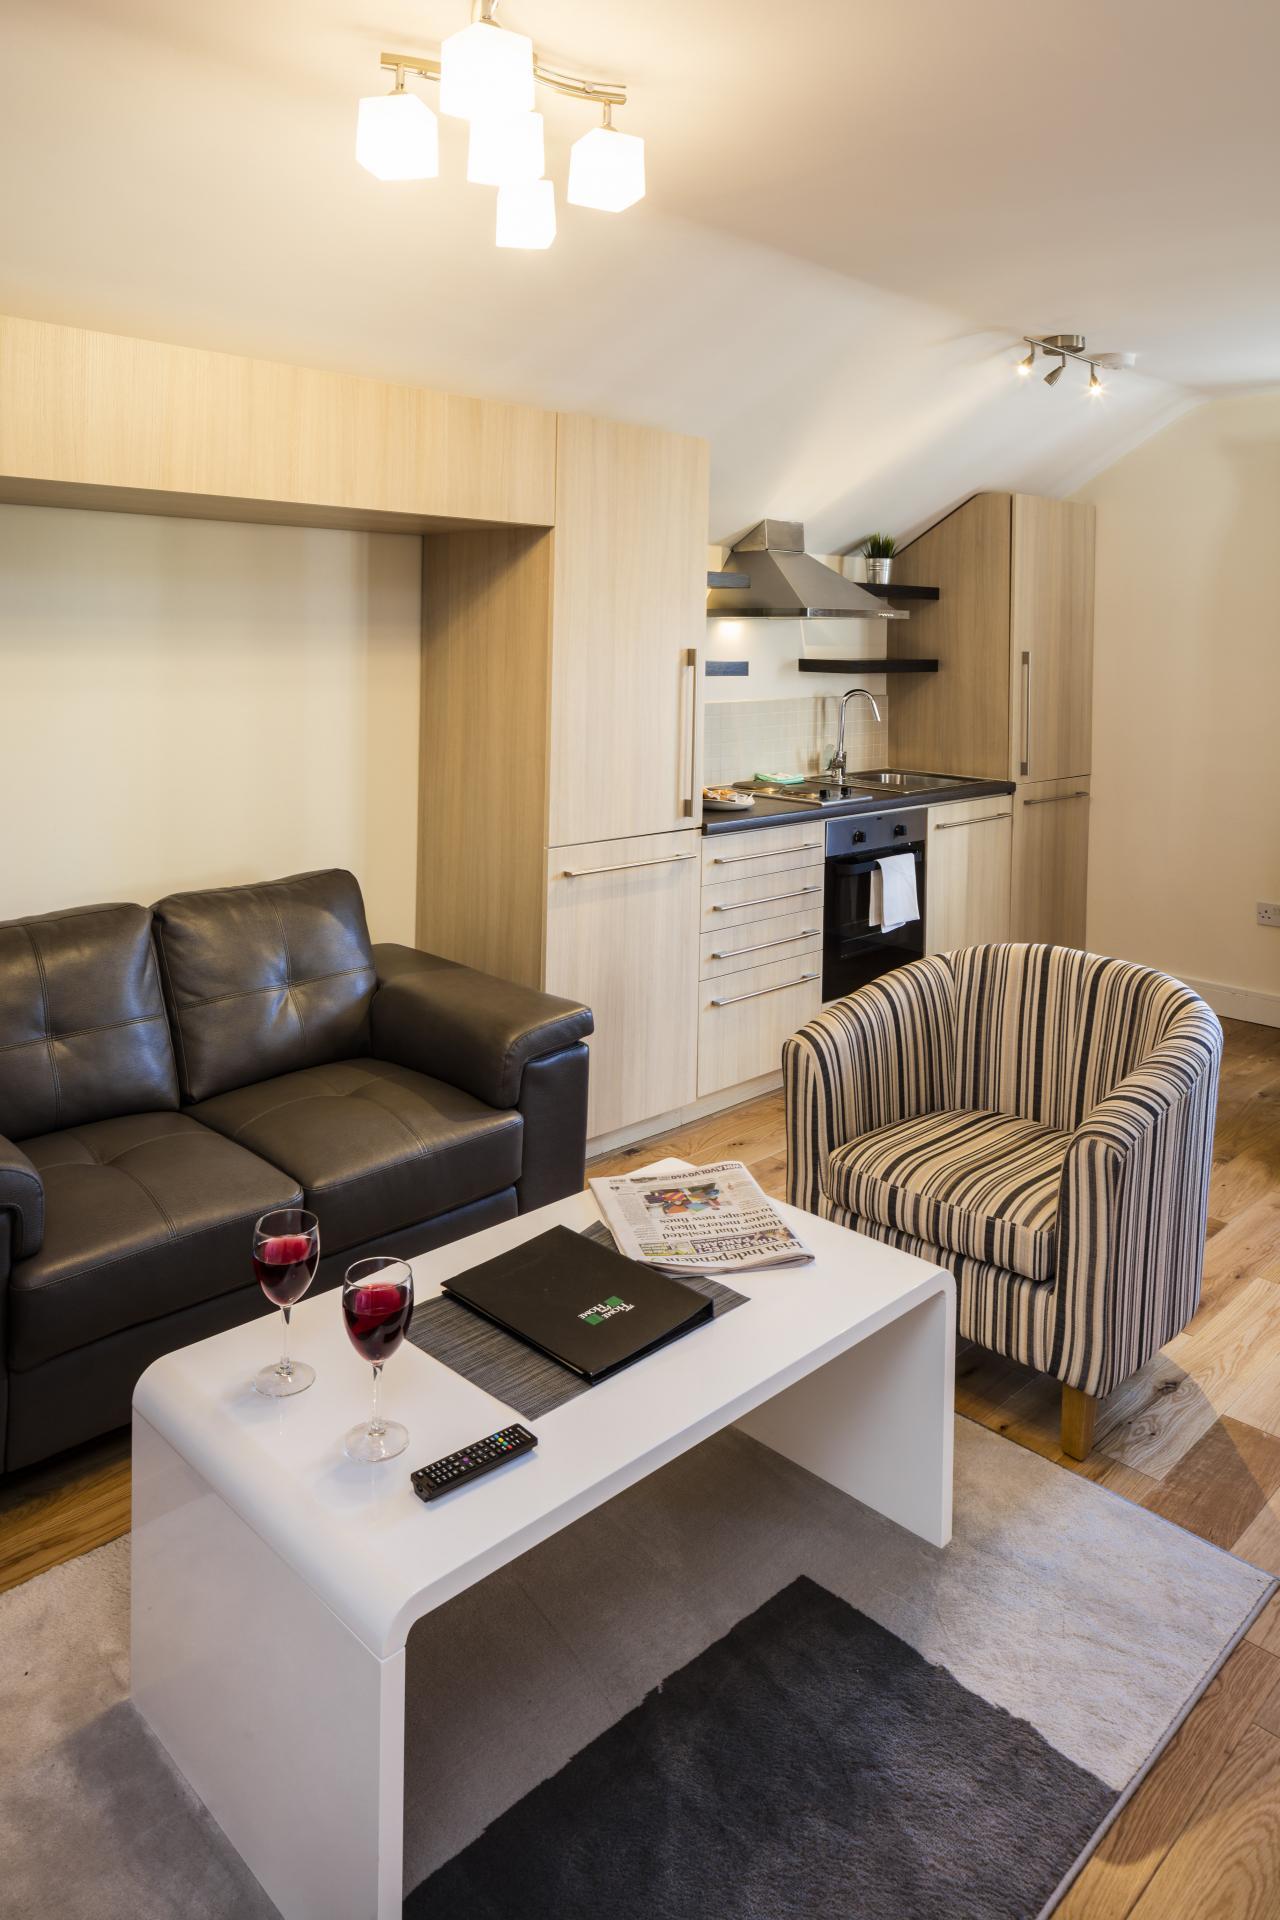 Sofas at Baggot Rath House Apartments, Ballsbridge, Dublin